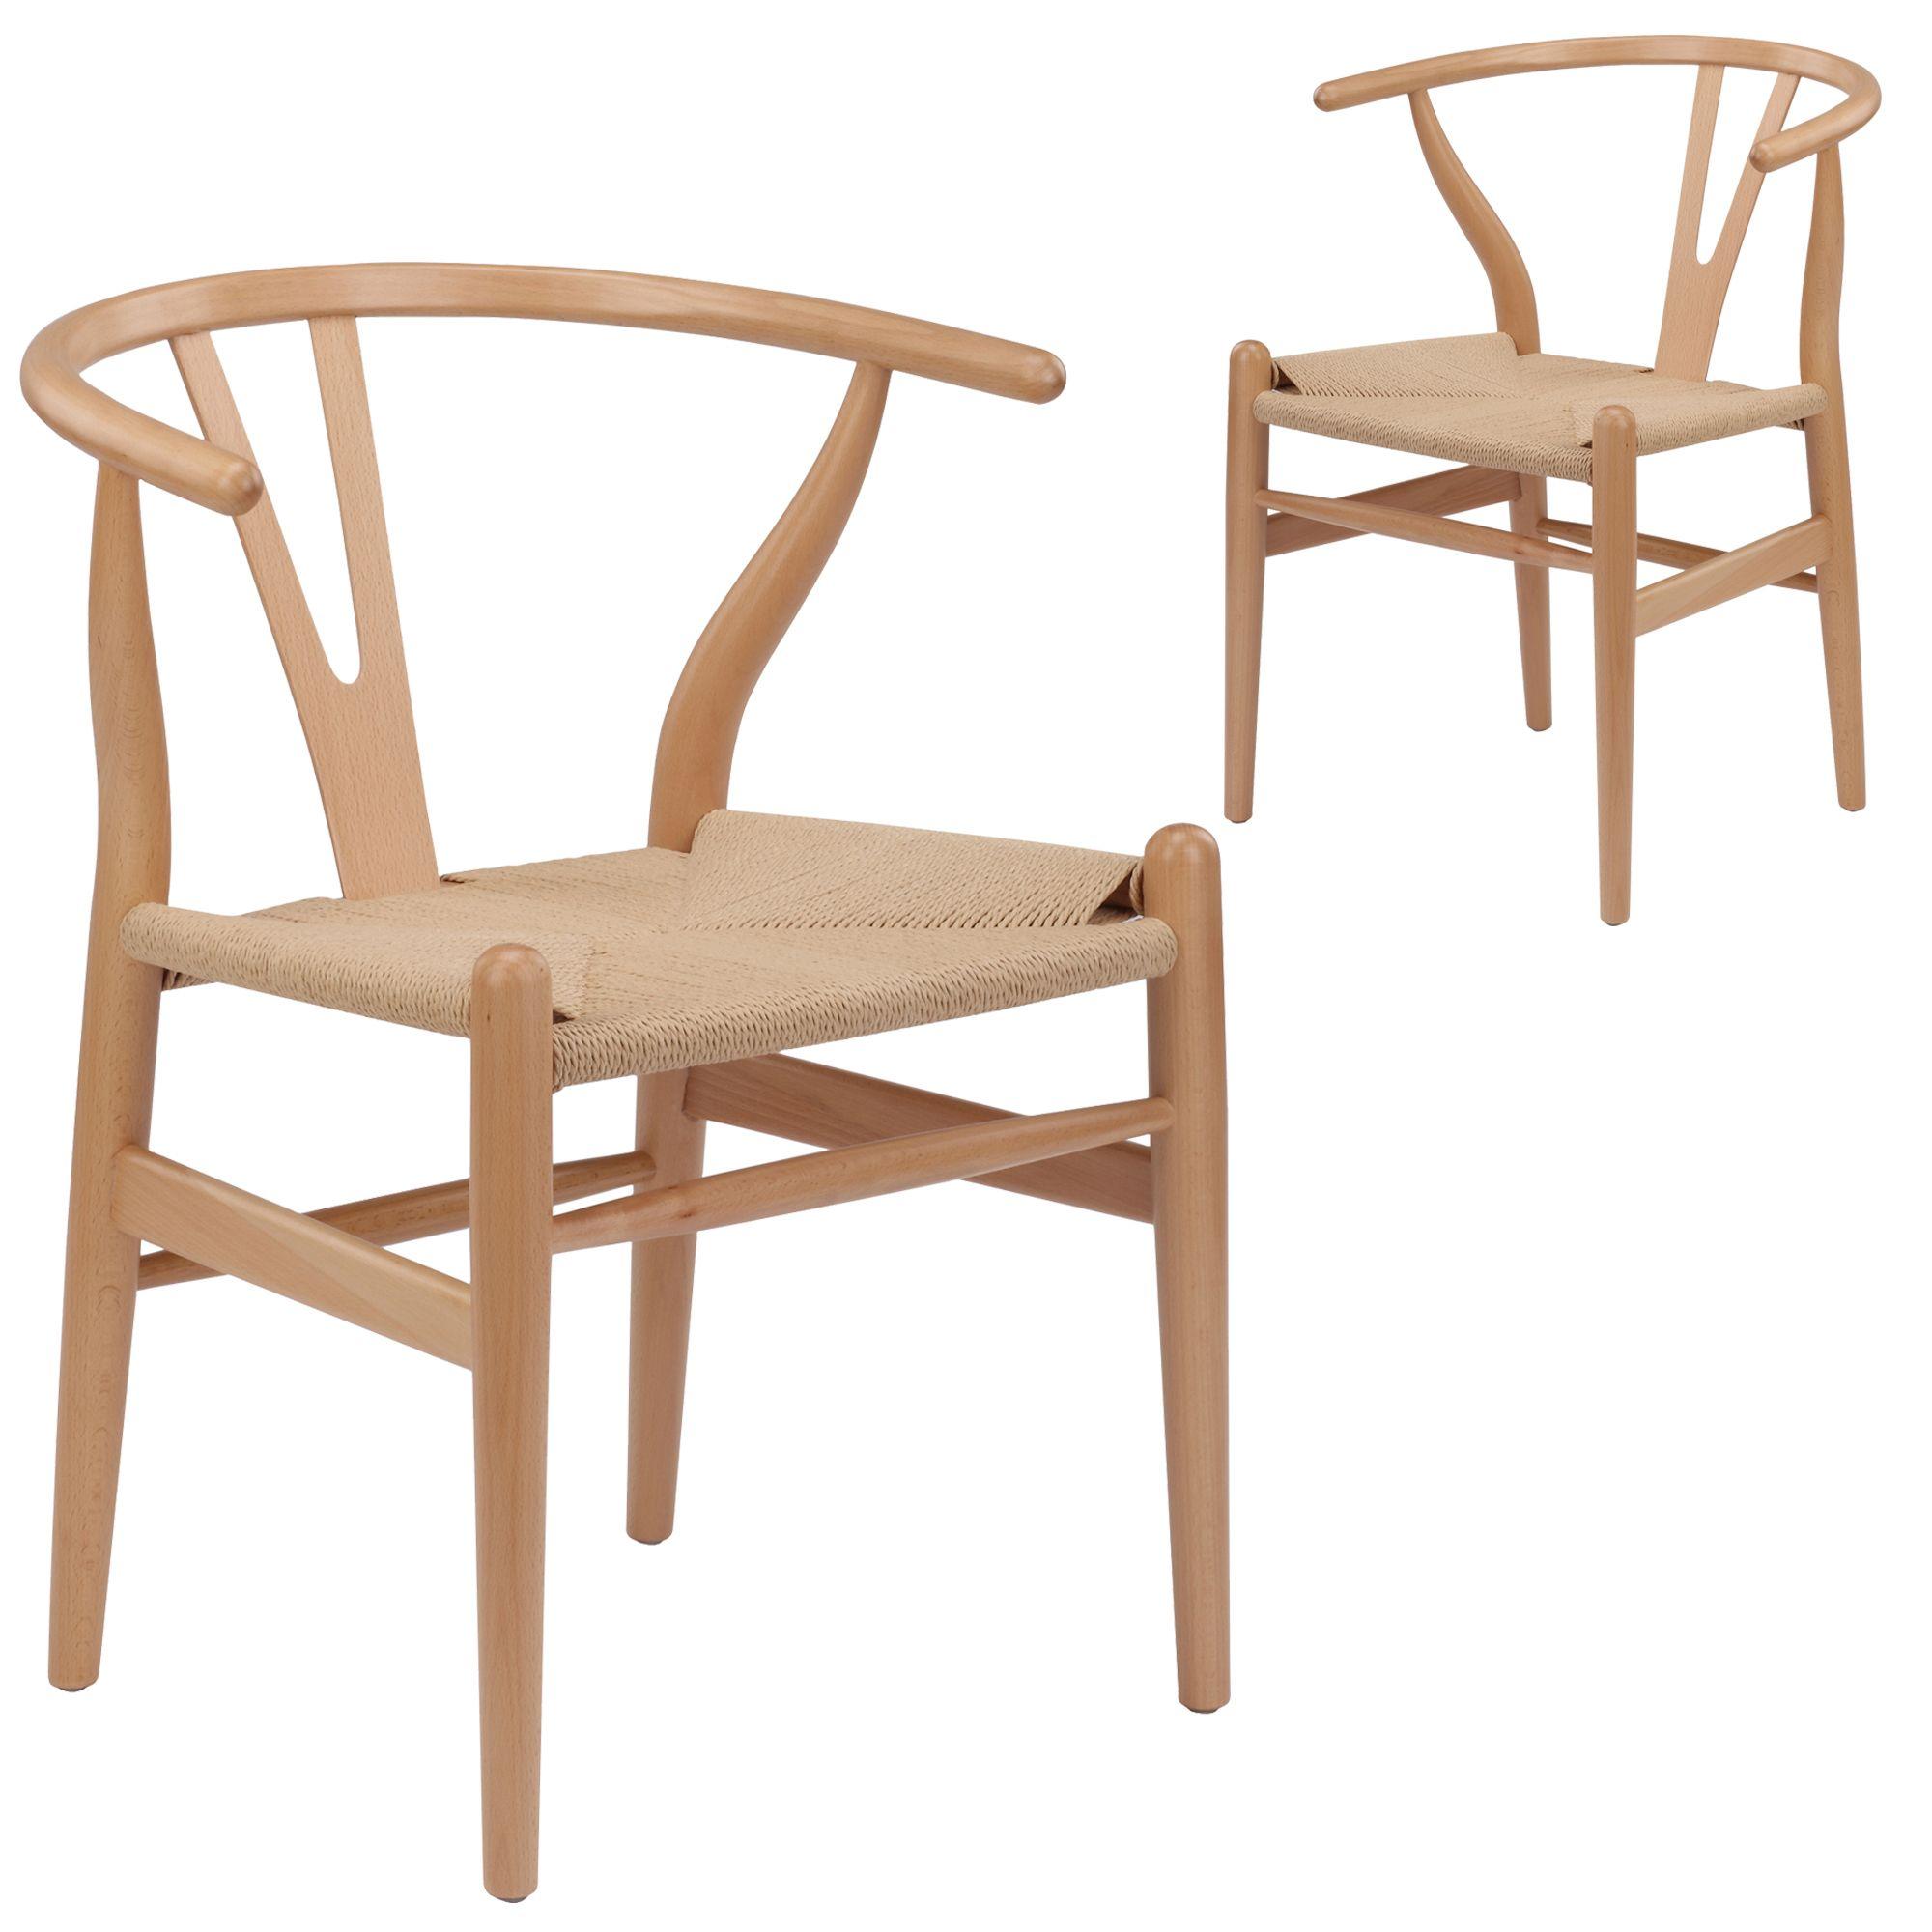 Natural Hans Wegner Replica Wishbone Chair (Set of 2